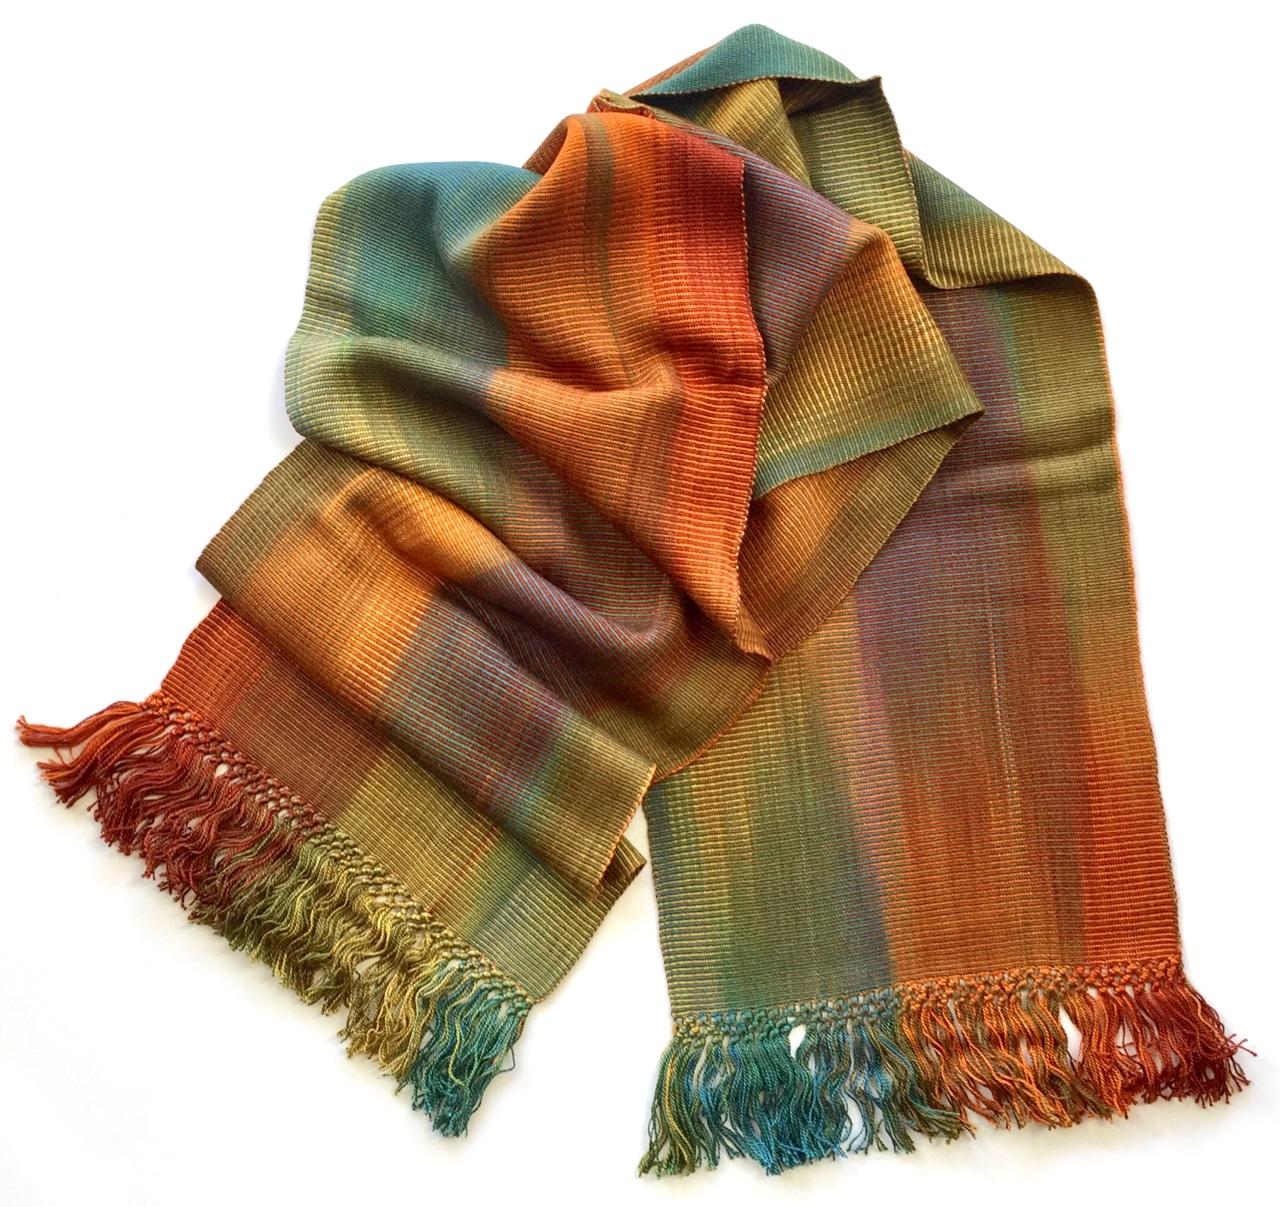 Autumn Rainbow - Lightweight Bamboo Handwoven Scarf 8 x 68